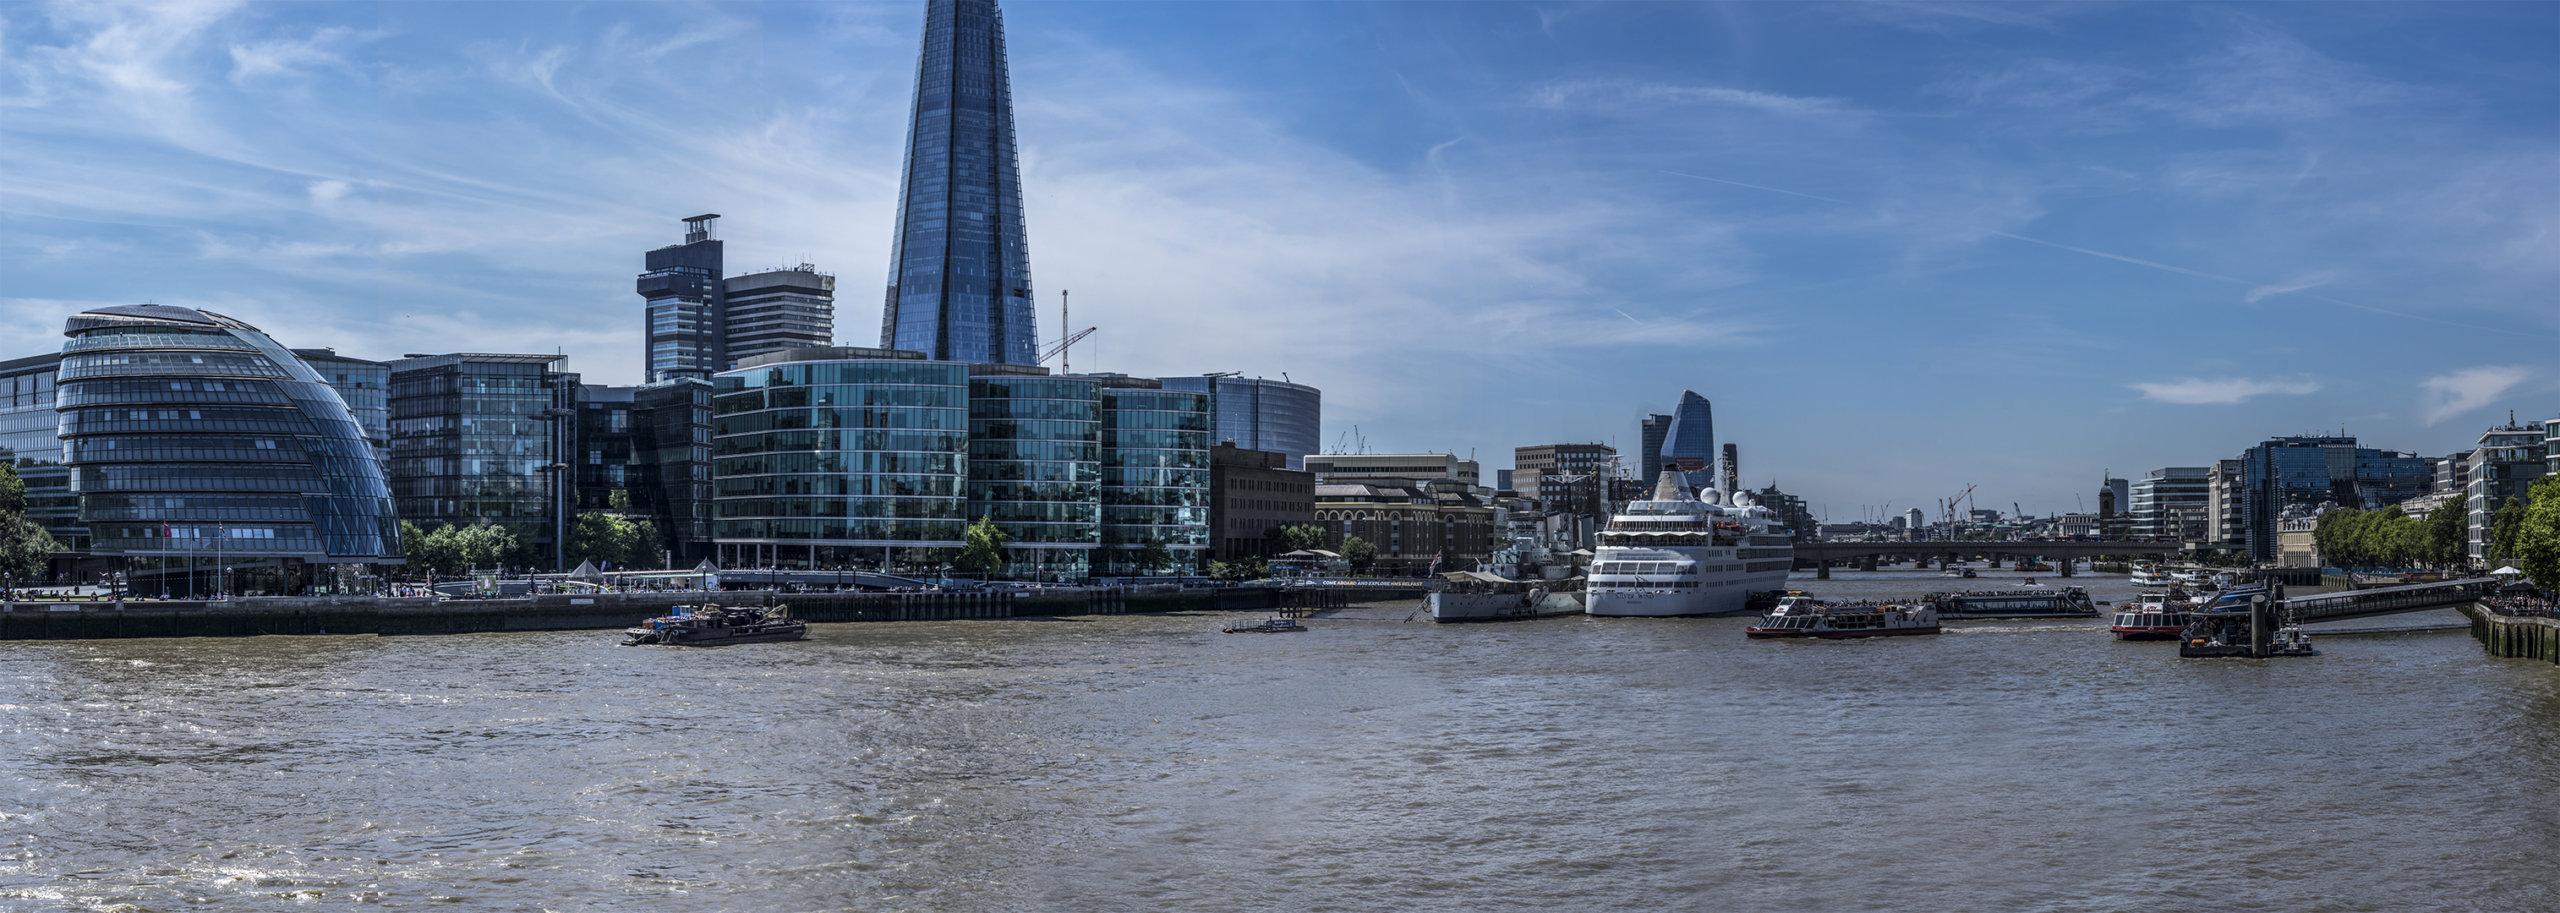 Londyn – Tamiza